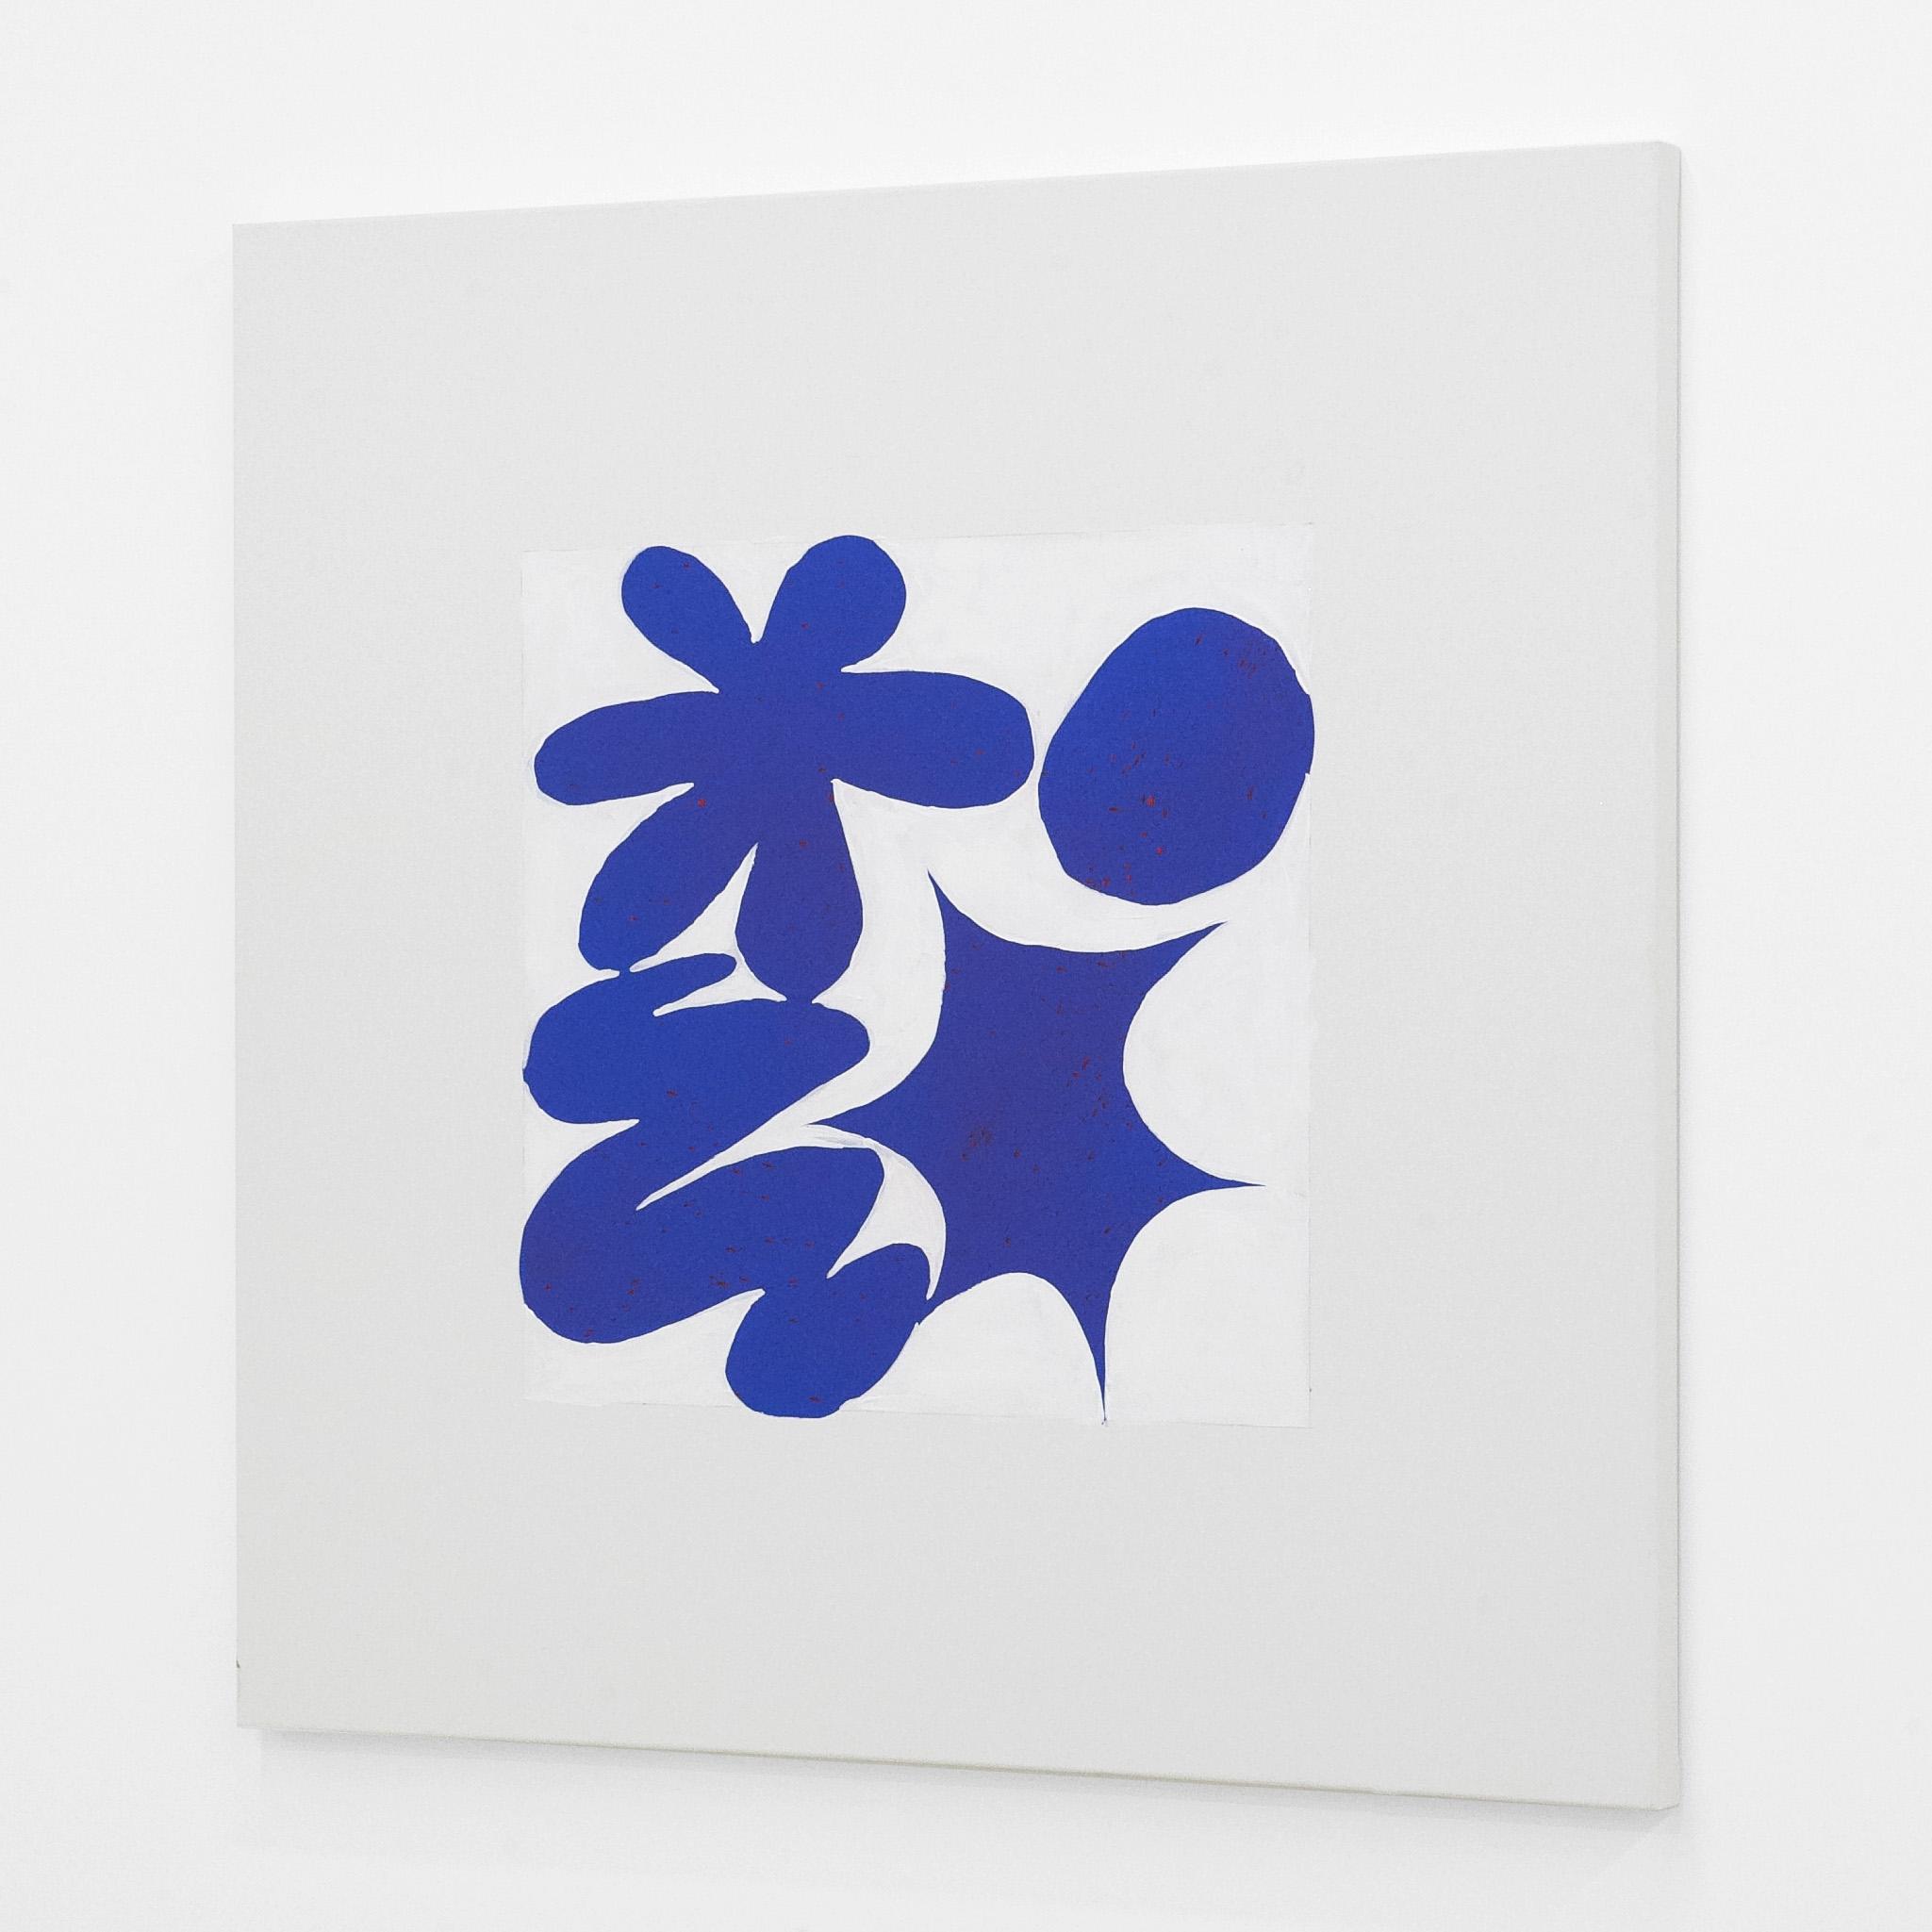 chazbear_lrg_square_blue_4.jpg